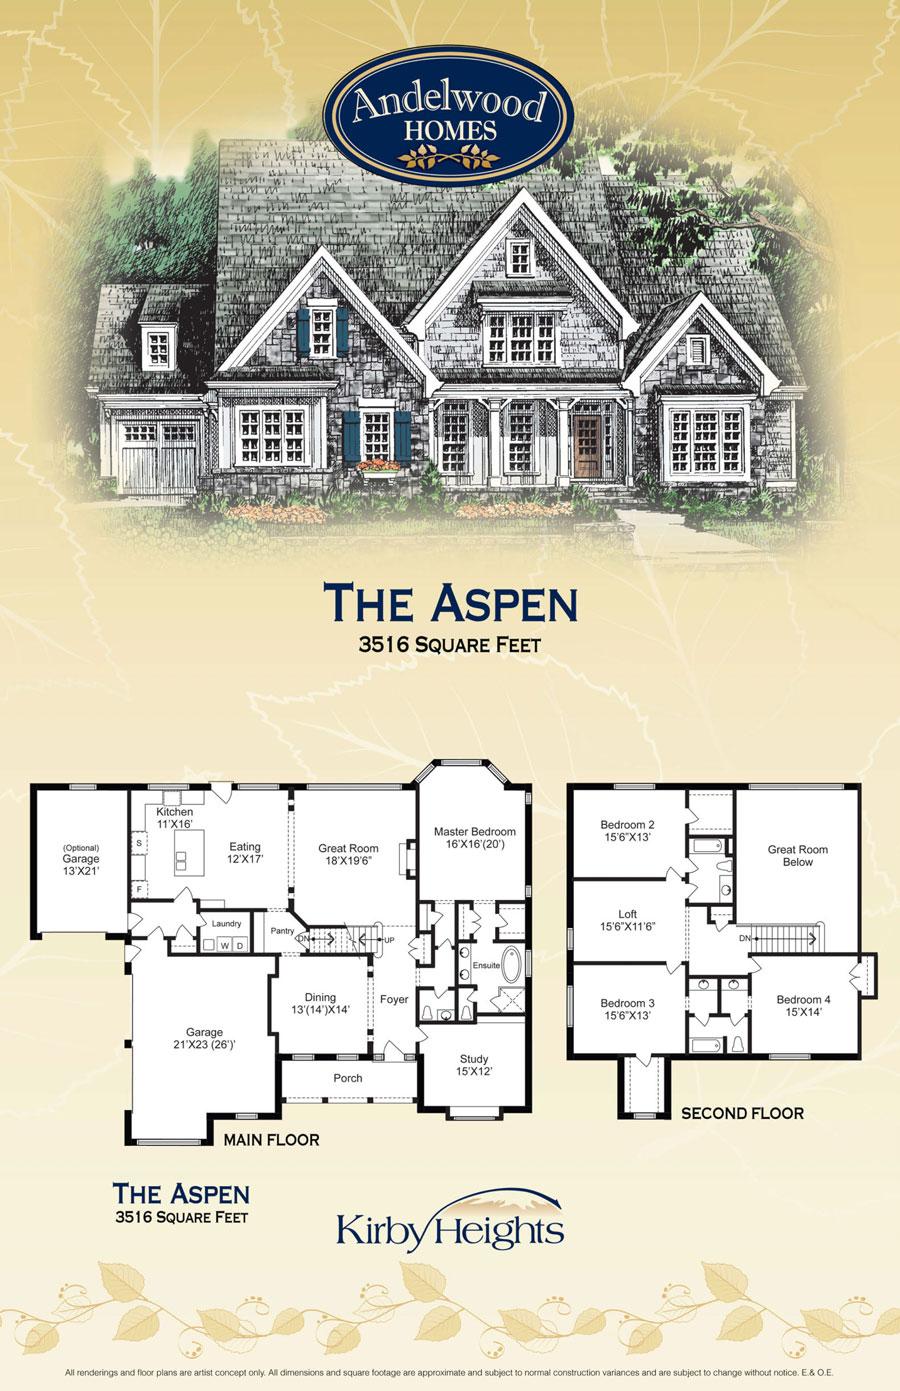 The Aspen